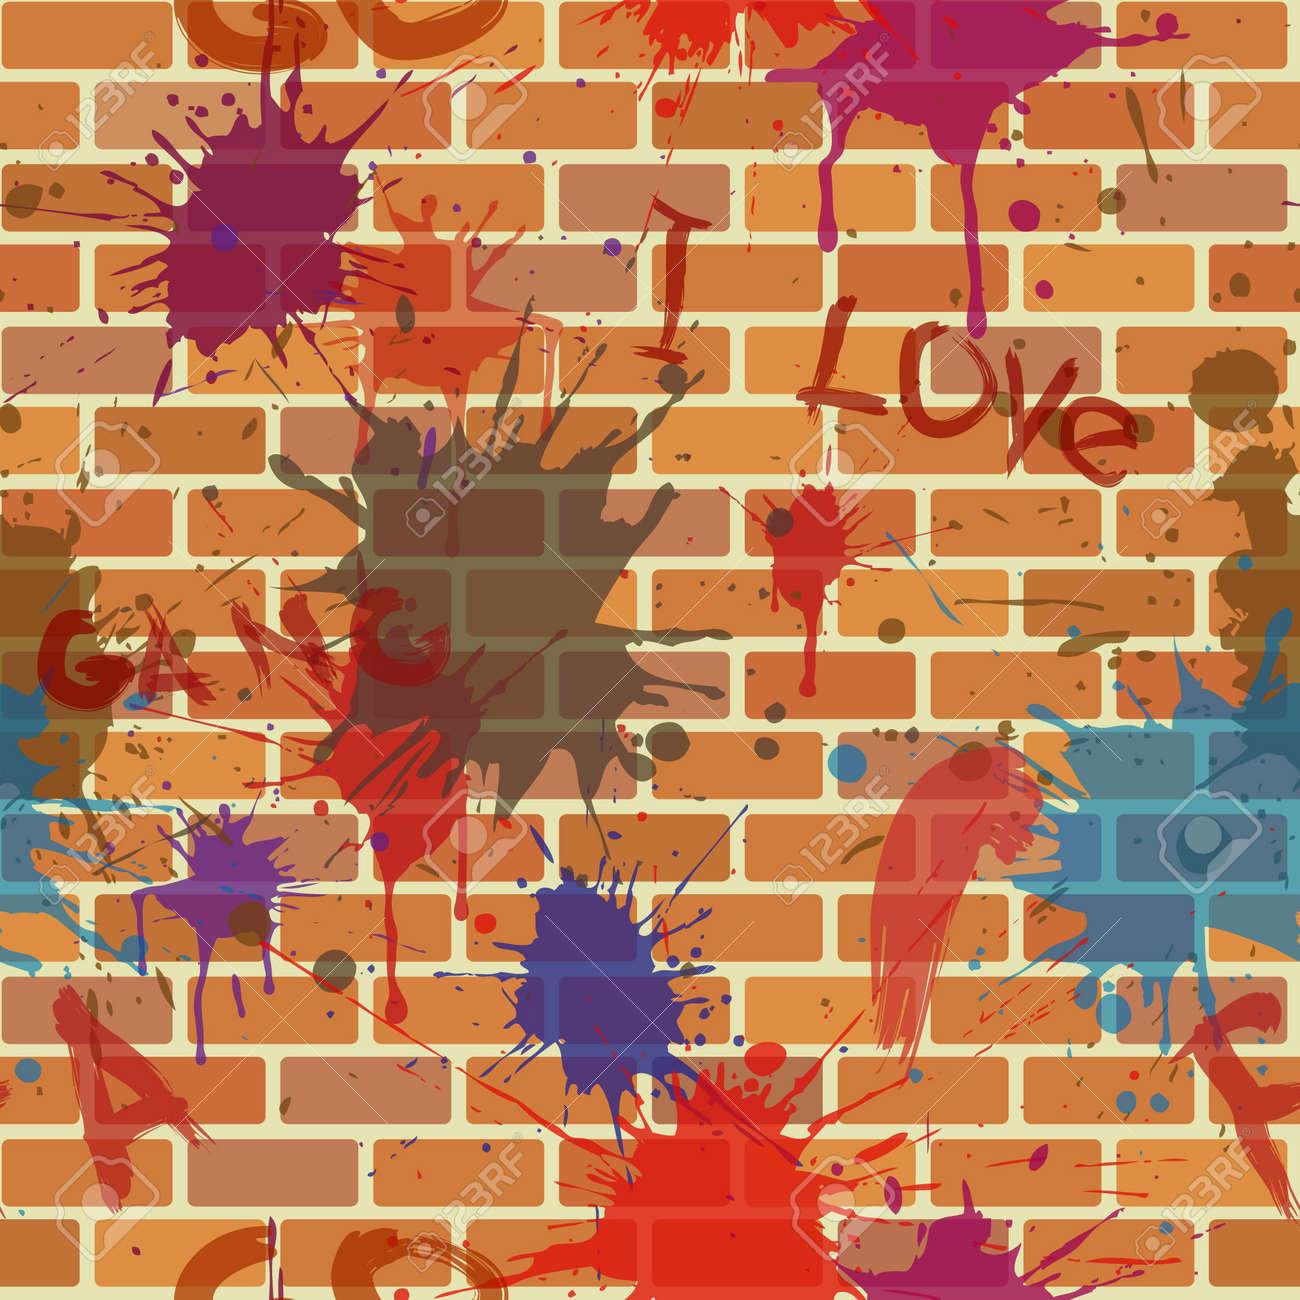 Graffiti wall clipart - Graffiti Wall Seamless Dirty Street Brick Wall With Graffiti And Colour Paint Blot